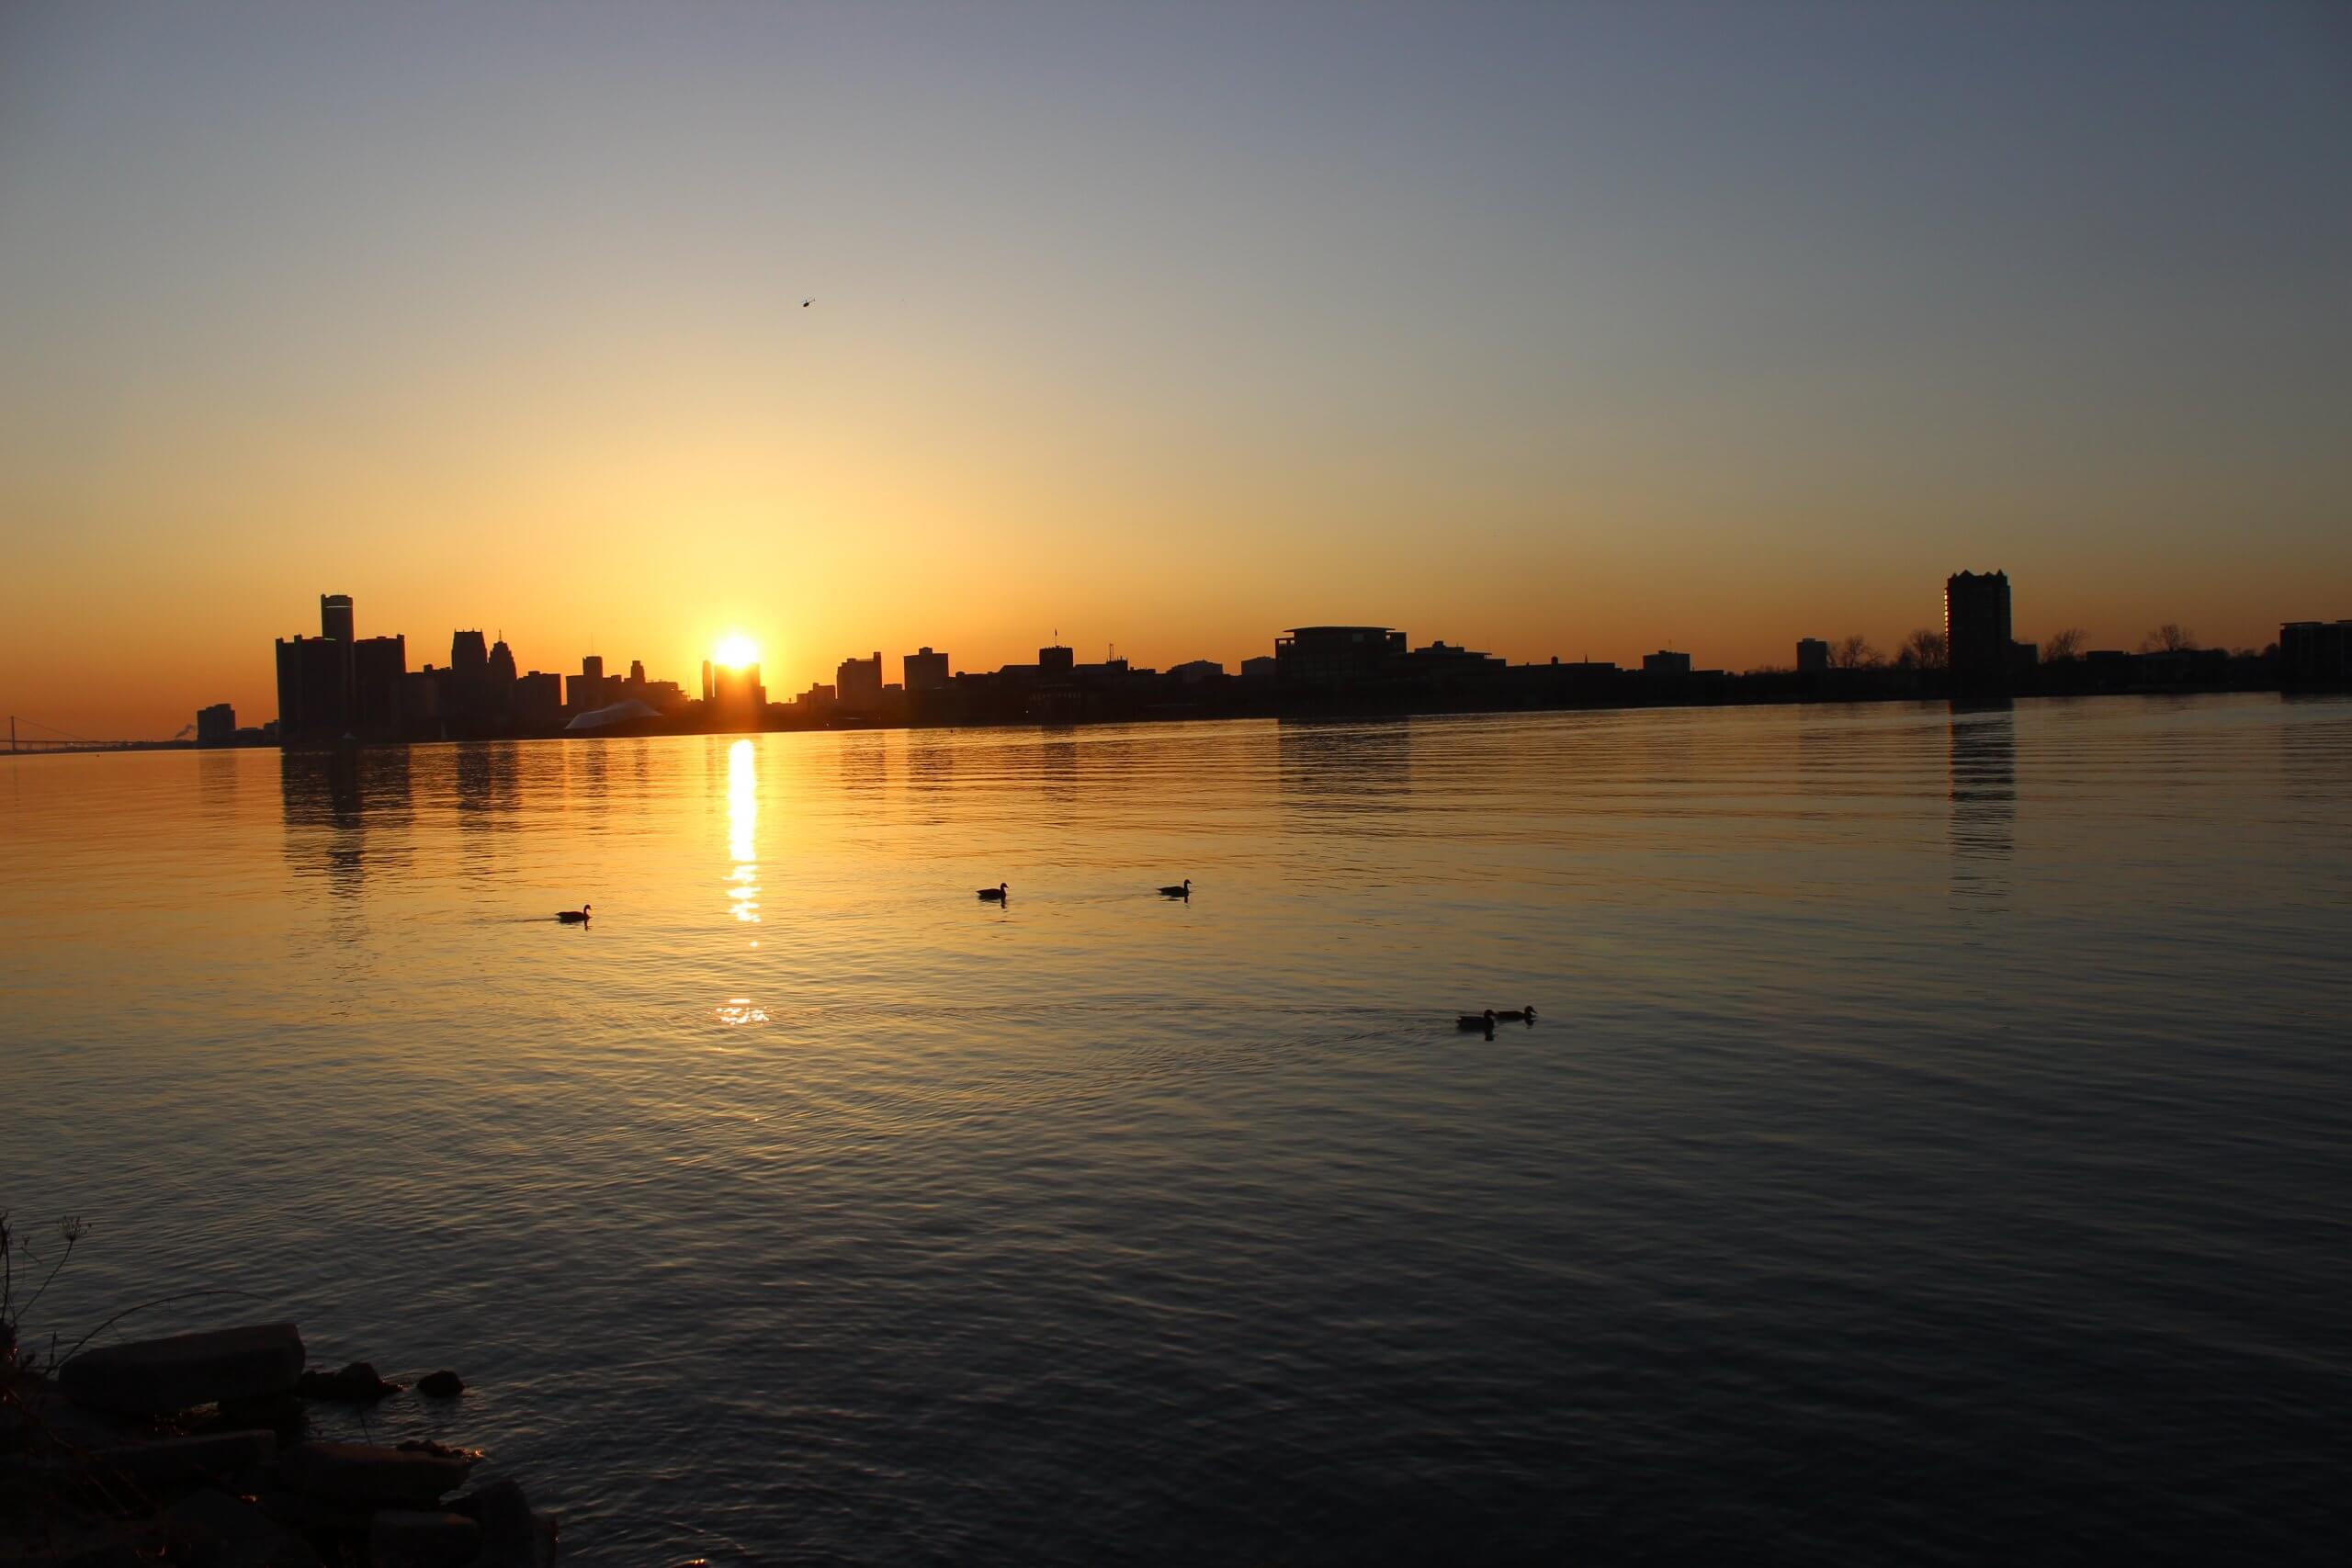 Detroit skyline taken from across the water at sunset